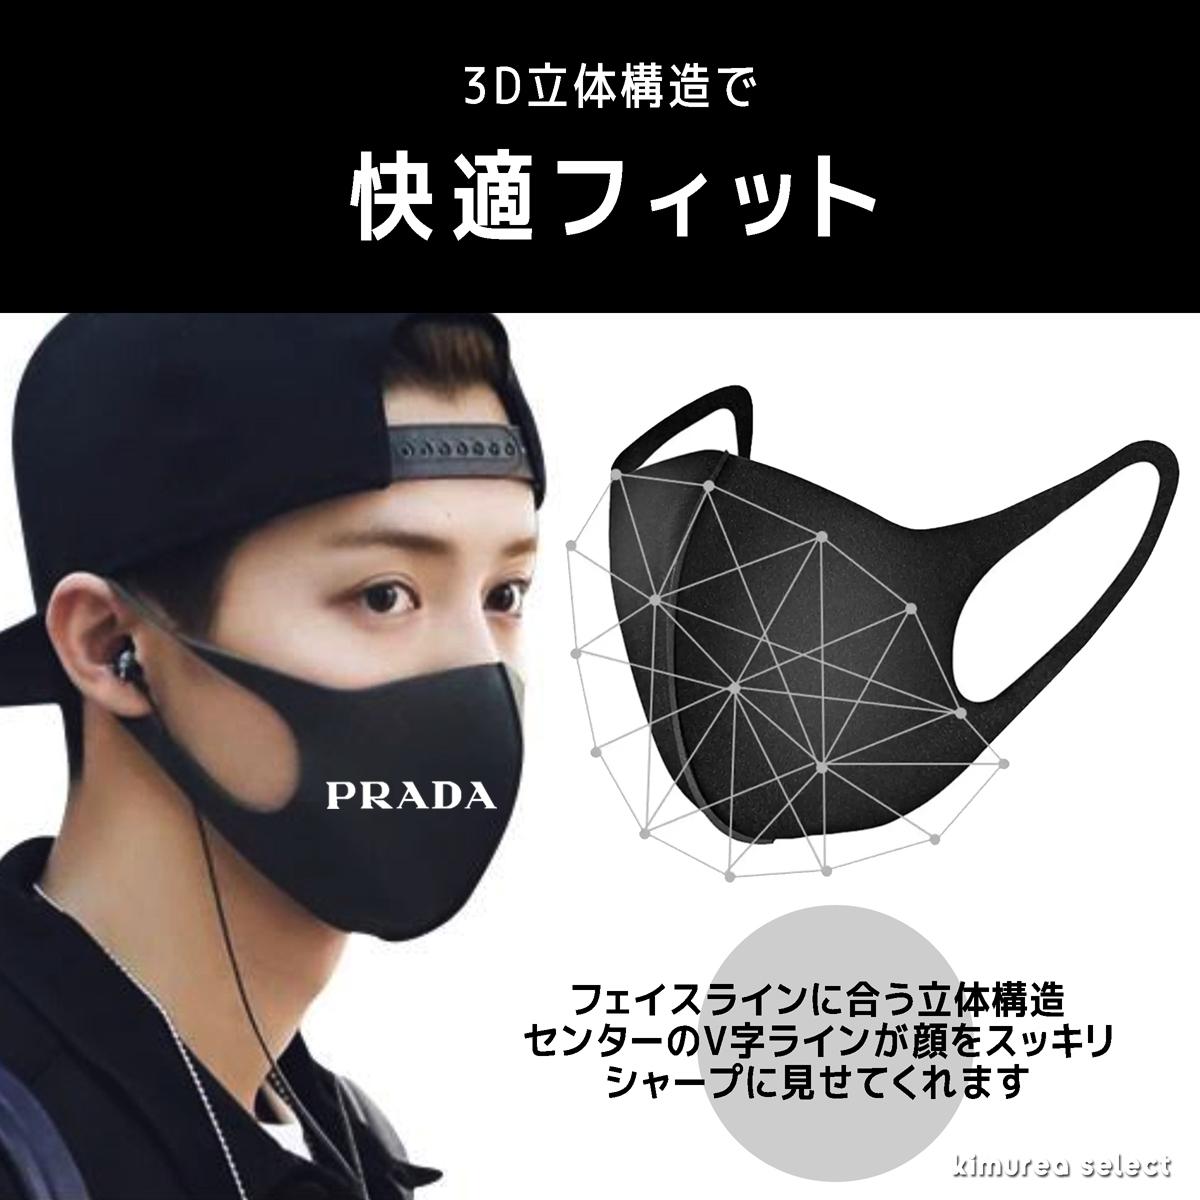 PRADA mask for adults